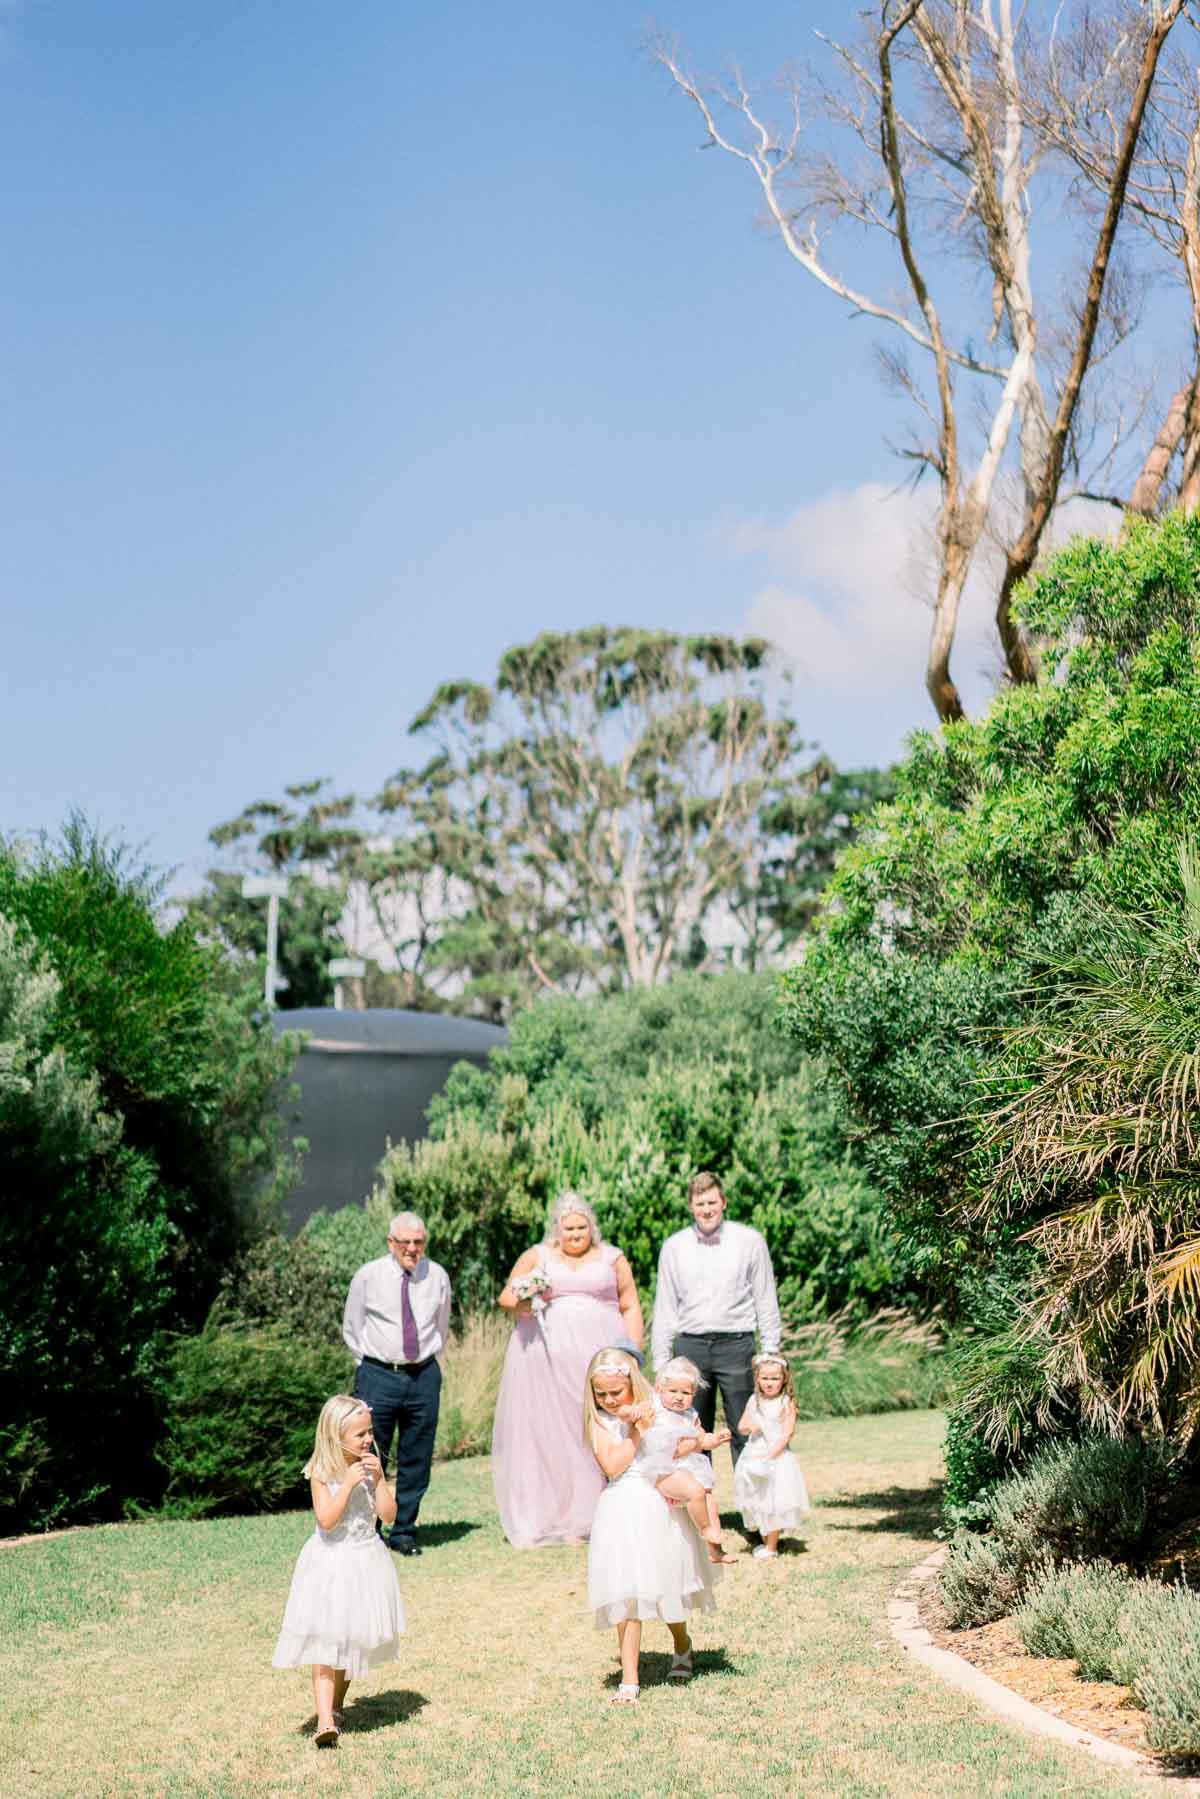 mt-eliza-mornington-peninsula-backyard-wedding-heart+soul-weddings-allison-matt-03140.jpg